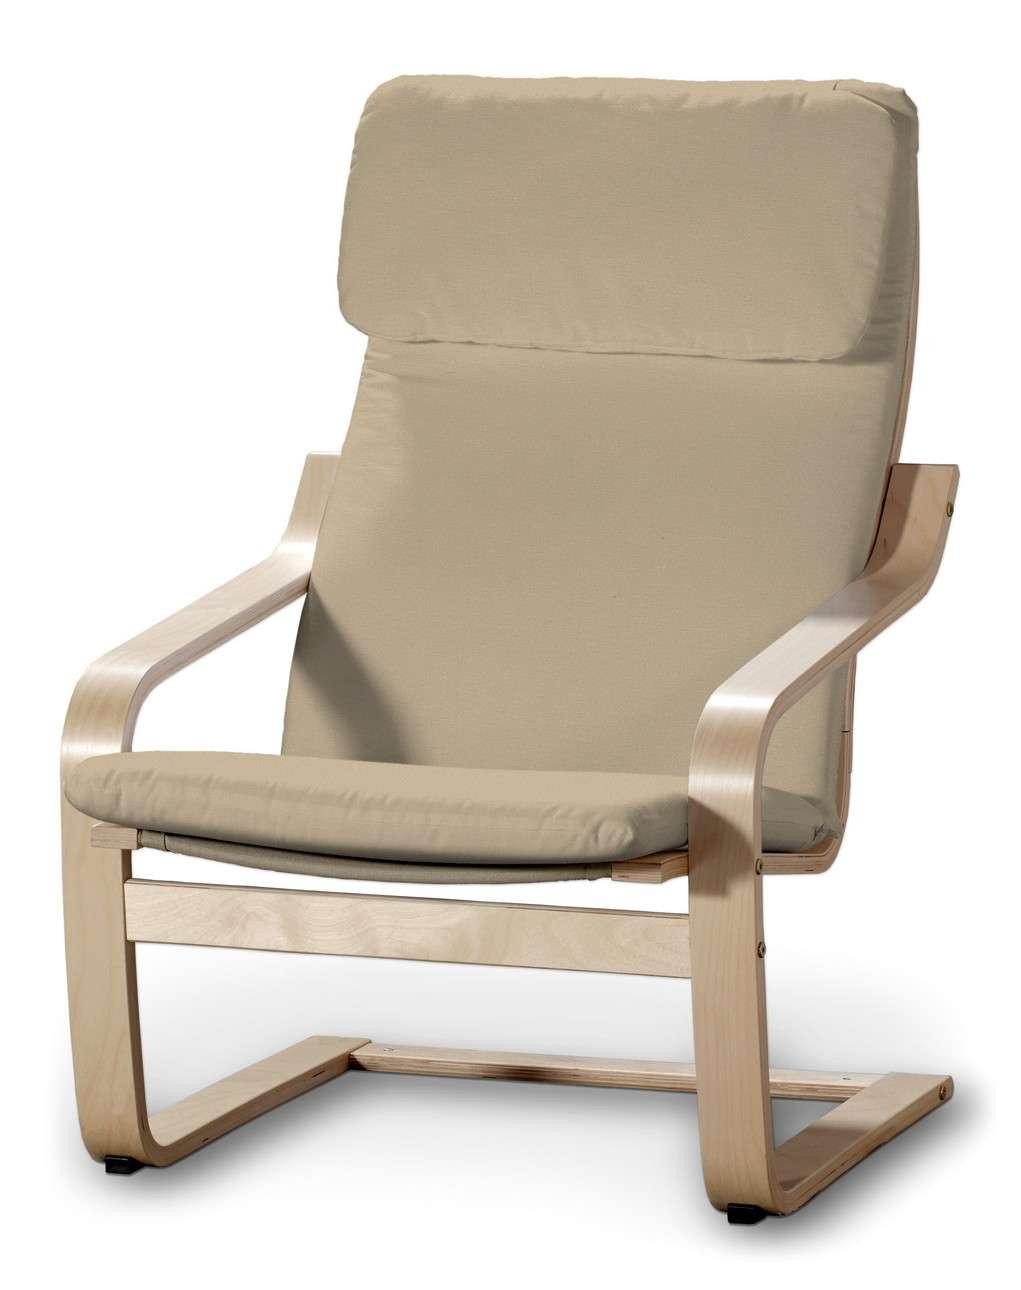 Poduszka na fotel Poäng w kolekcji Living, tkanina: 160-82